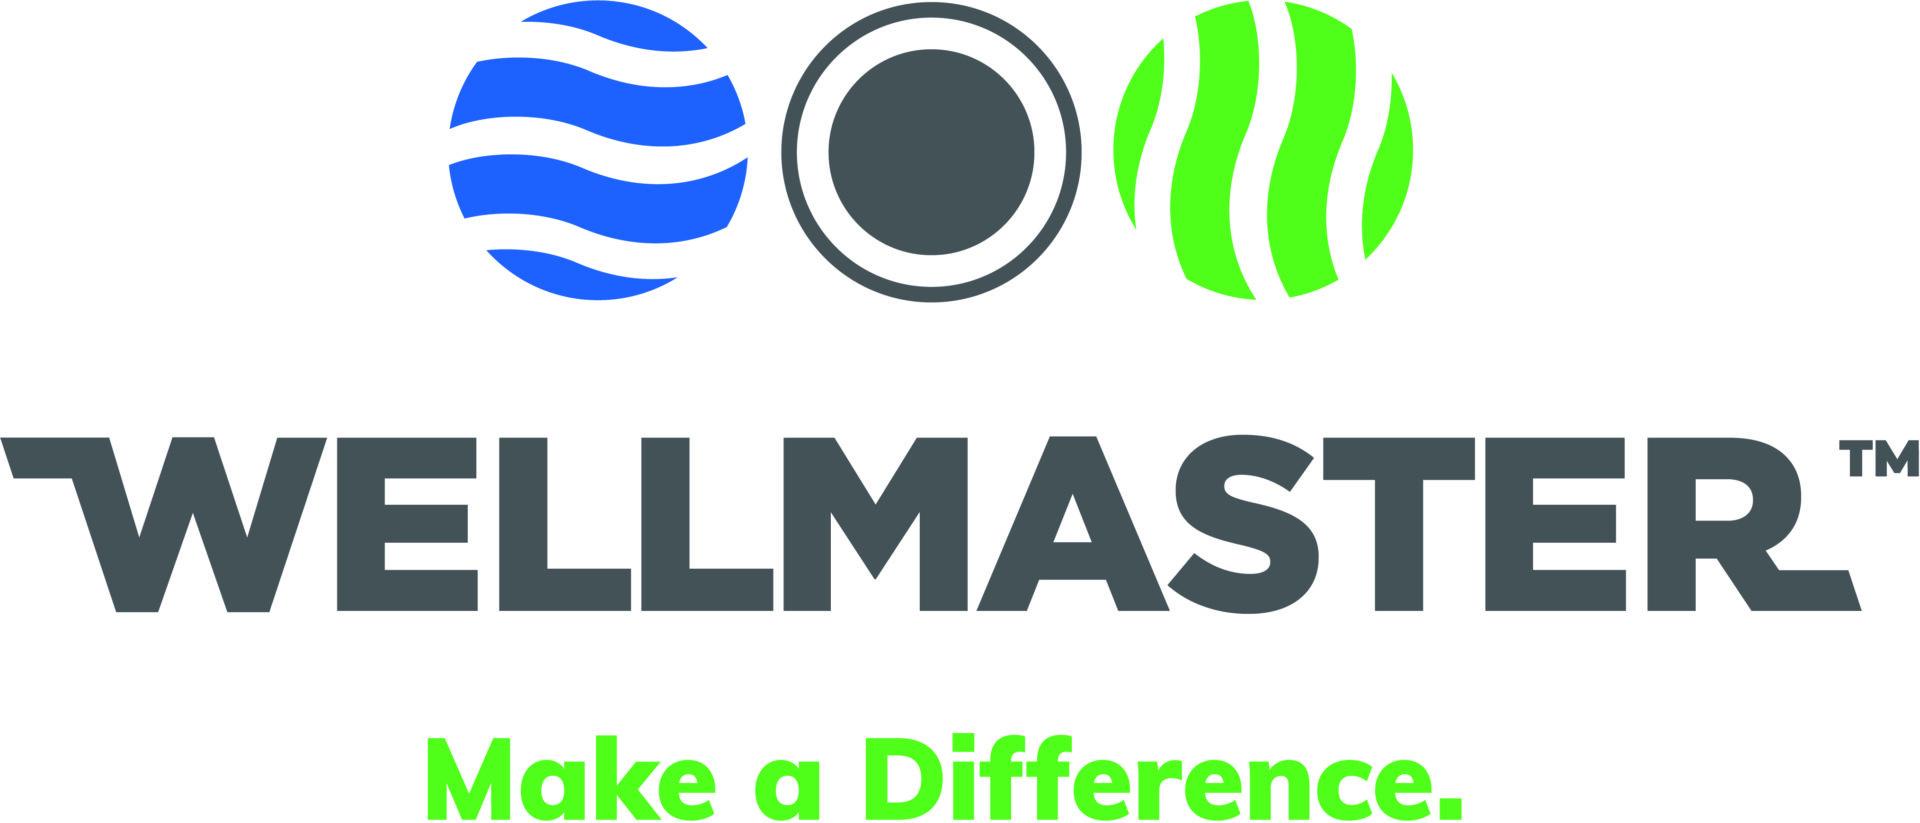 https://secureservercdn.net/192.169.220.85/96z.68b.myftpupload.com/wp-content/uploads/2021/02/Wellmaster_Logo-scaled.jpg